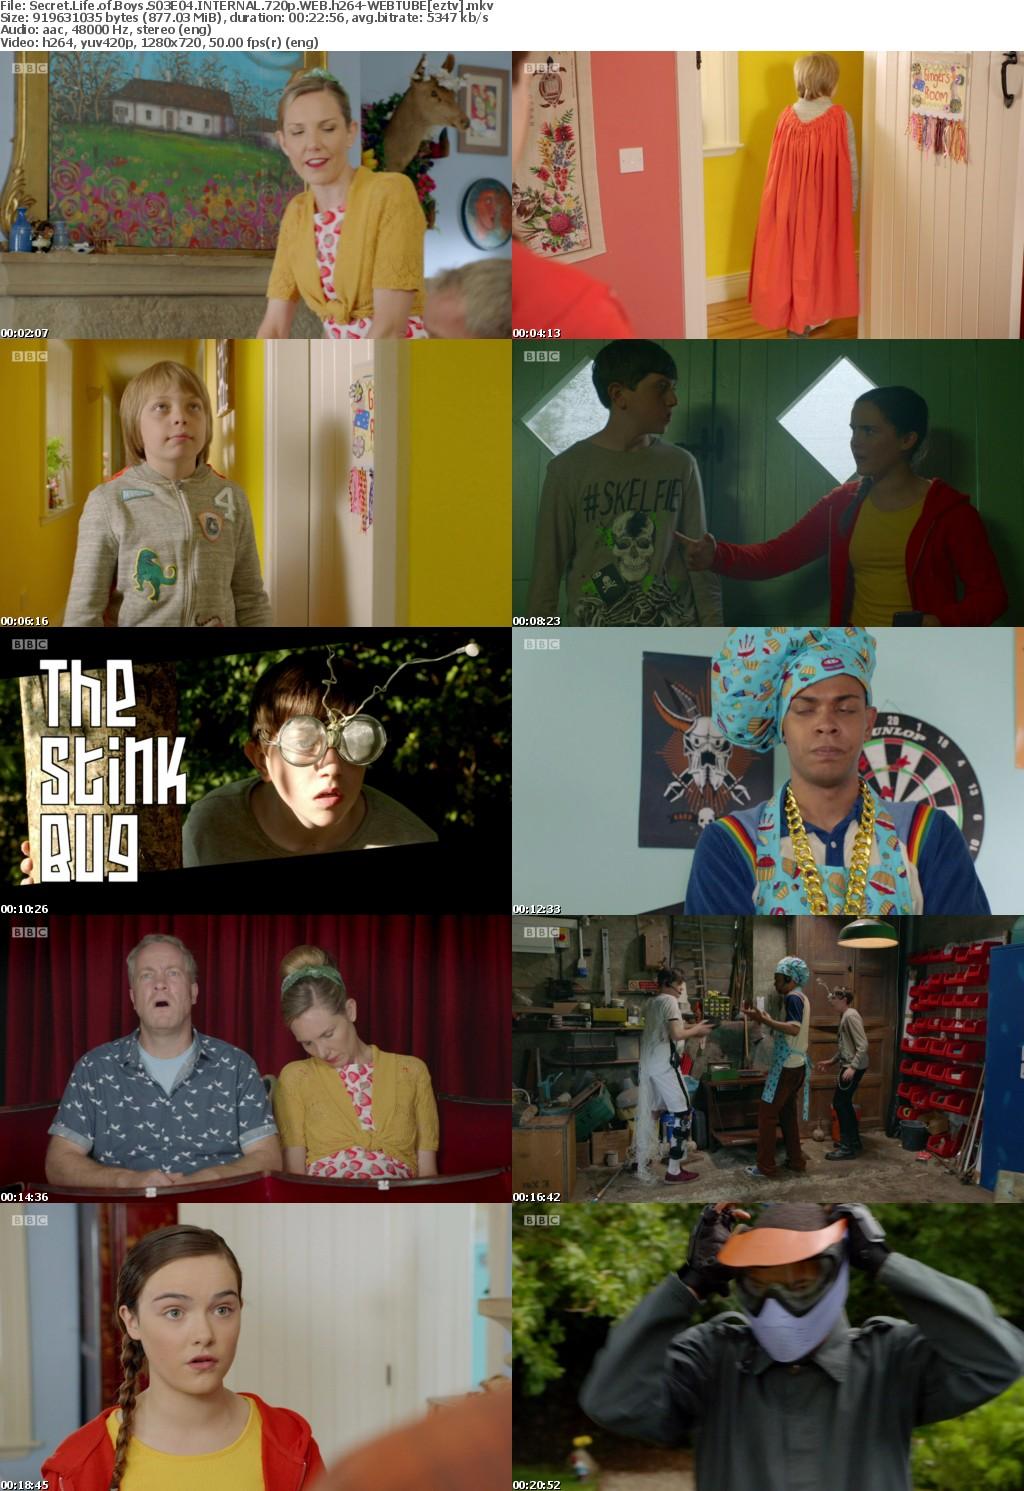 Secret Life of Boys S03E04 INTERNAL 720p WEB h264-WEBTUBE